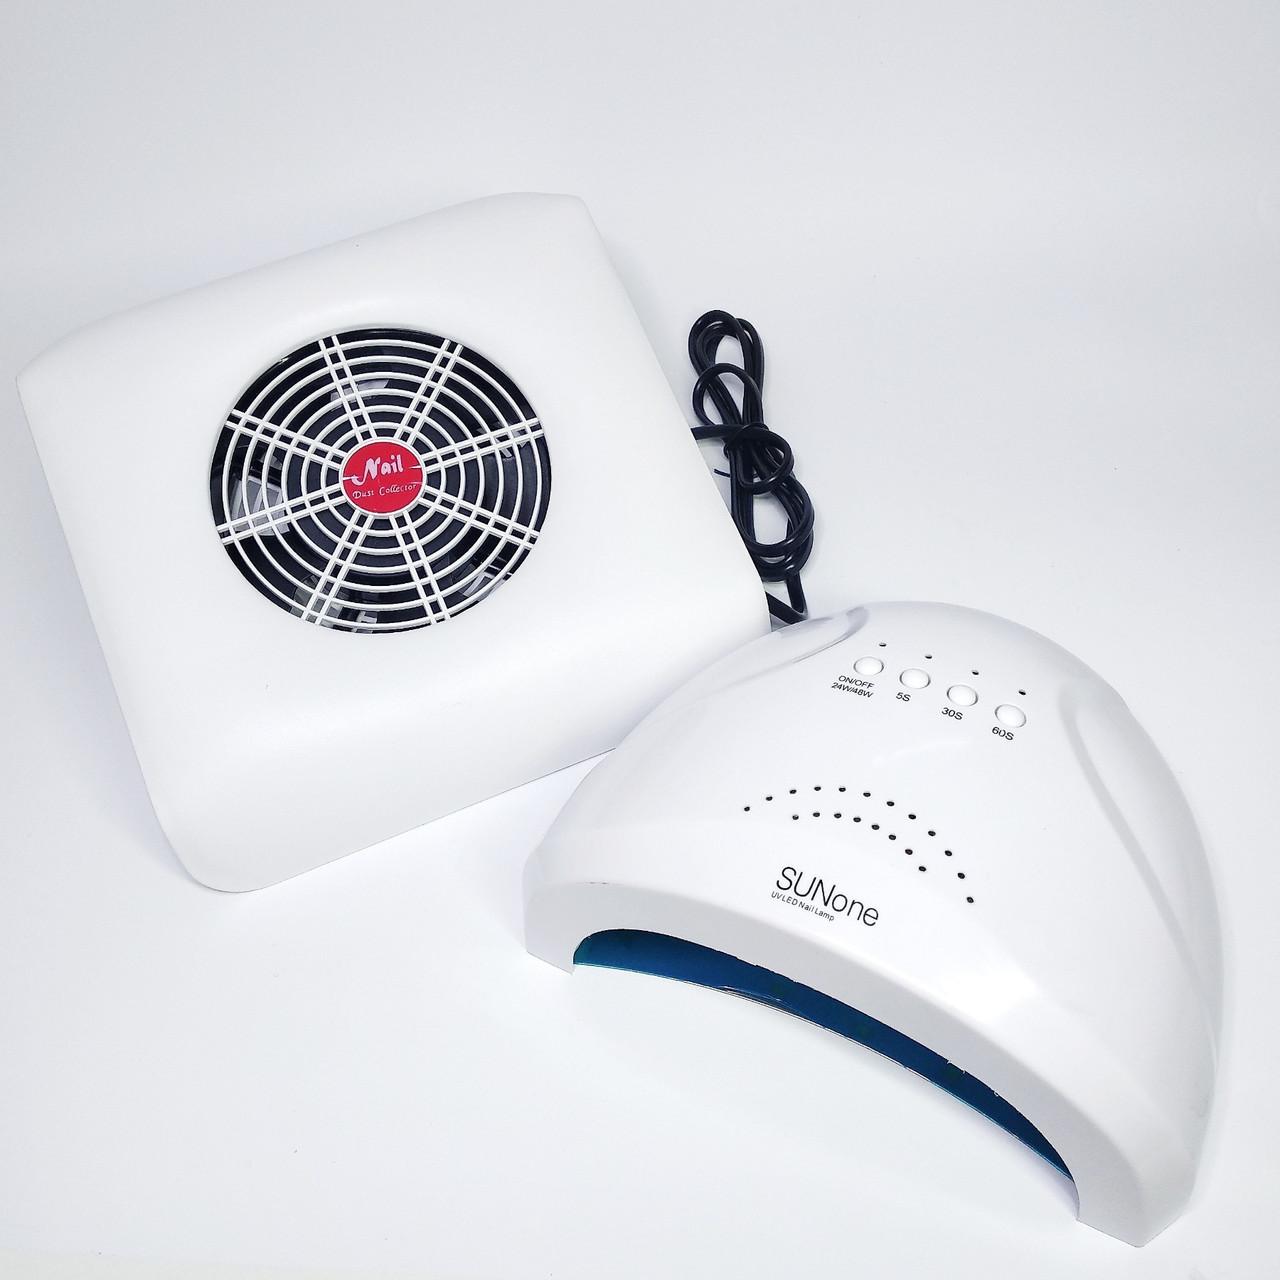 Стартовый набор для мастера маникюра LED Лампа SunOne + вытяжка